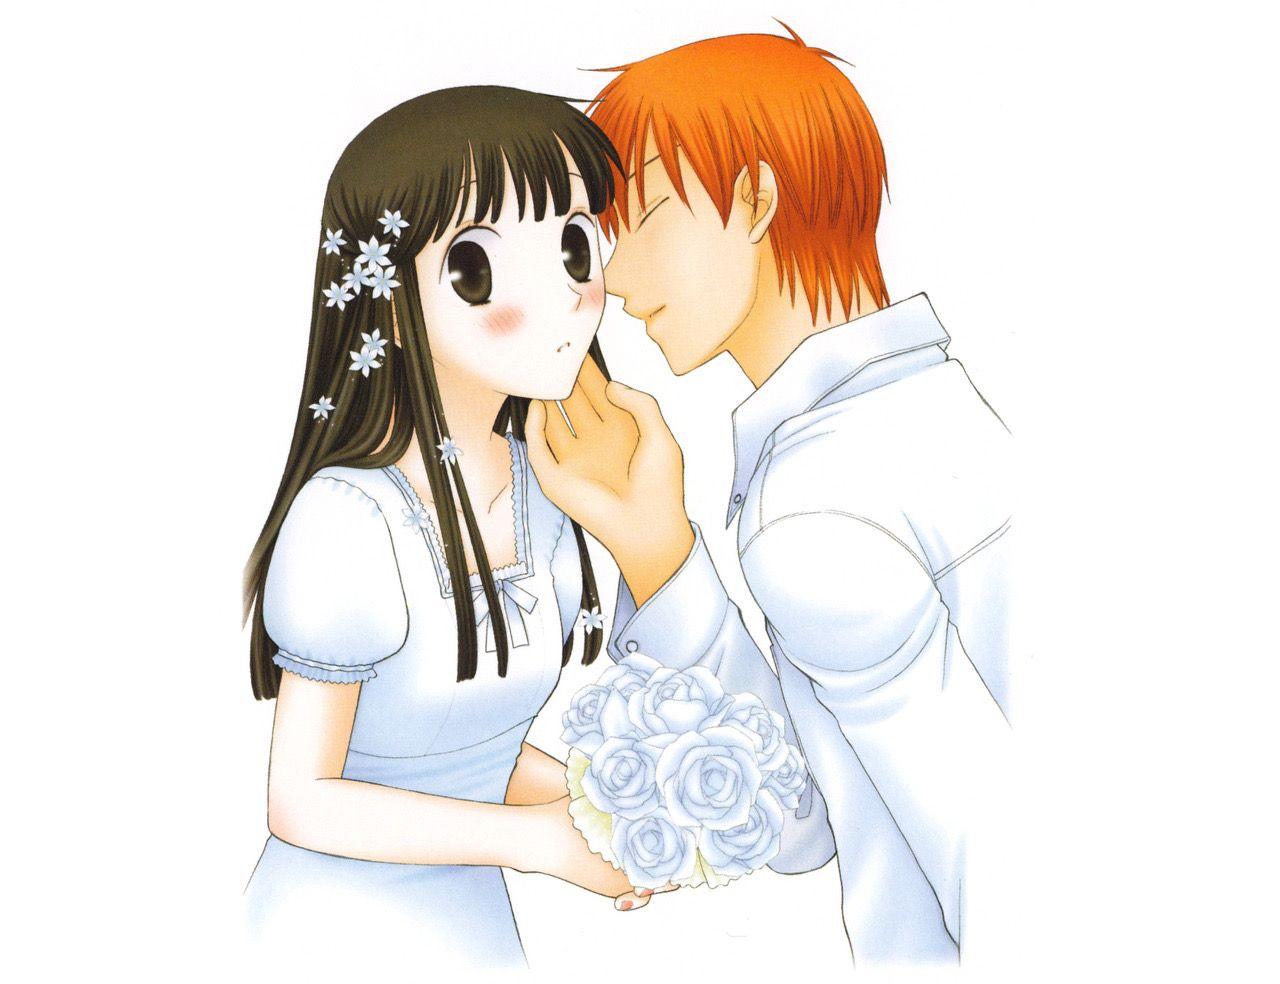 Omggg i'm in loveeee (avec images) Anime mangas, Dessin